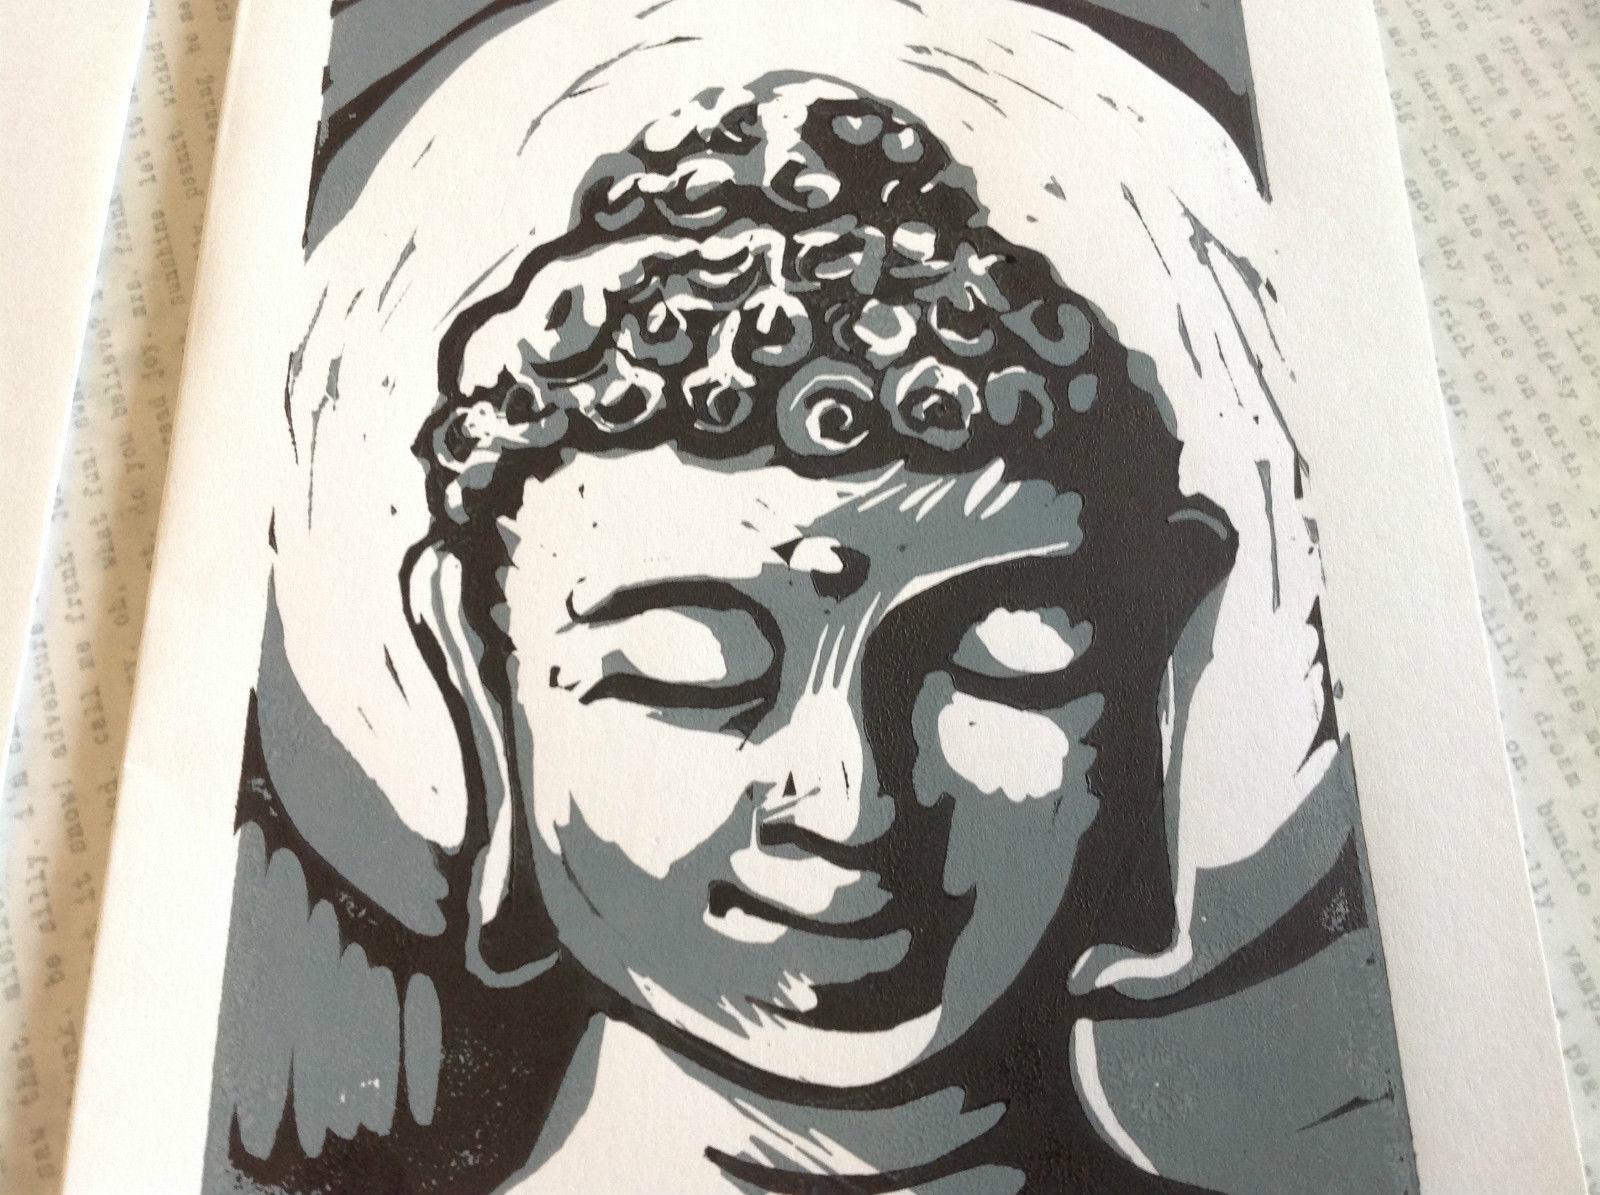 Gray and White Buddha Original Wood Block Handmade Greeting Card with Envelope